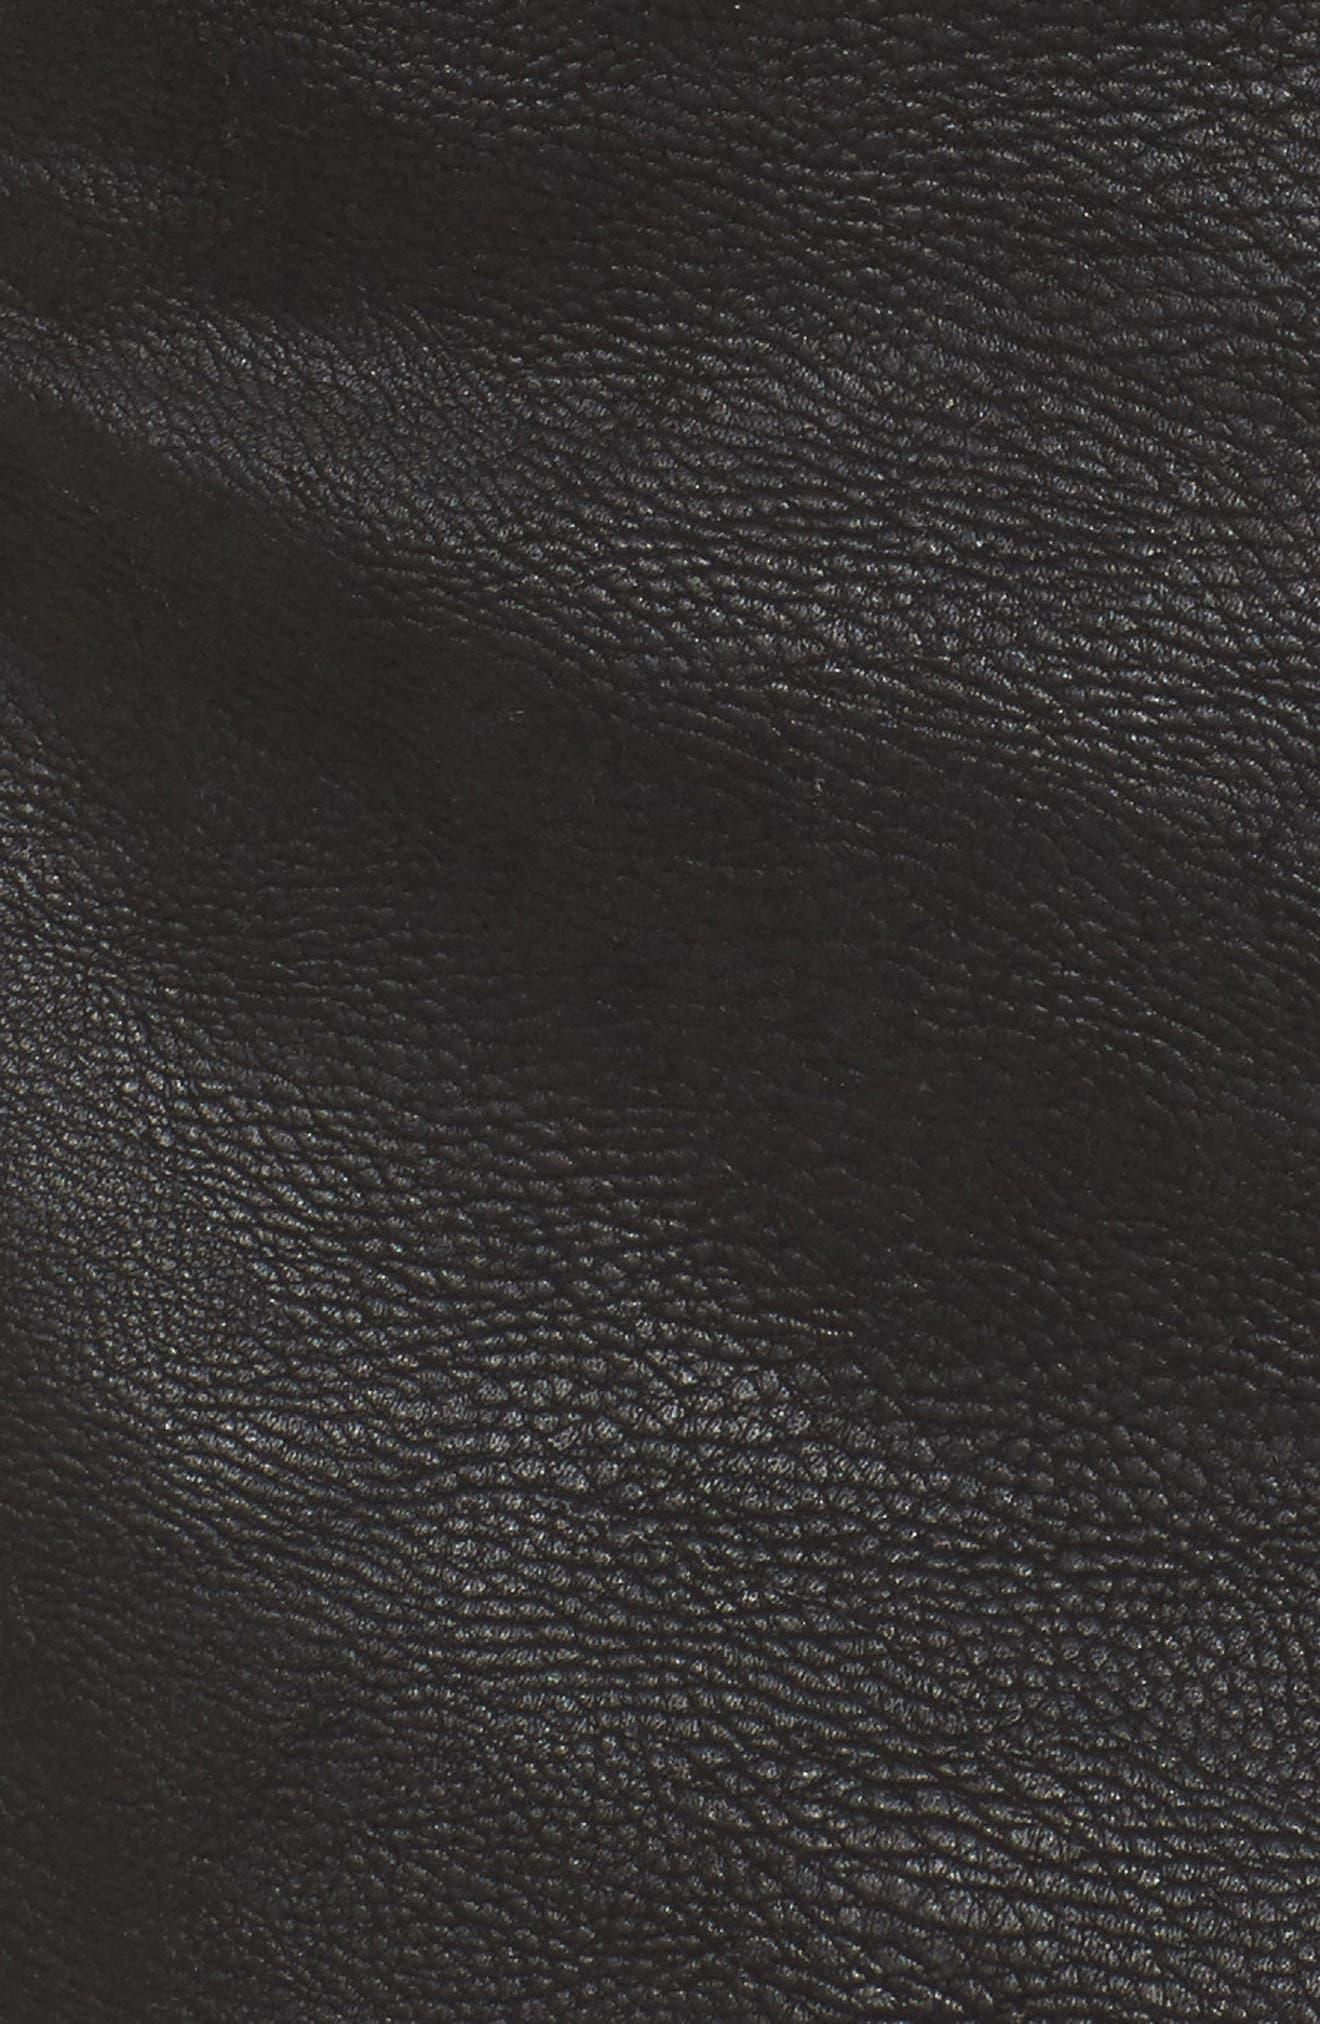 Studded Faux Leather Miniskirt,                             Alternate thumbnail 5, color,                             001